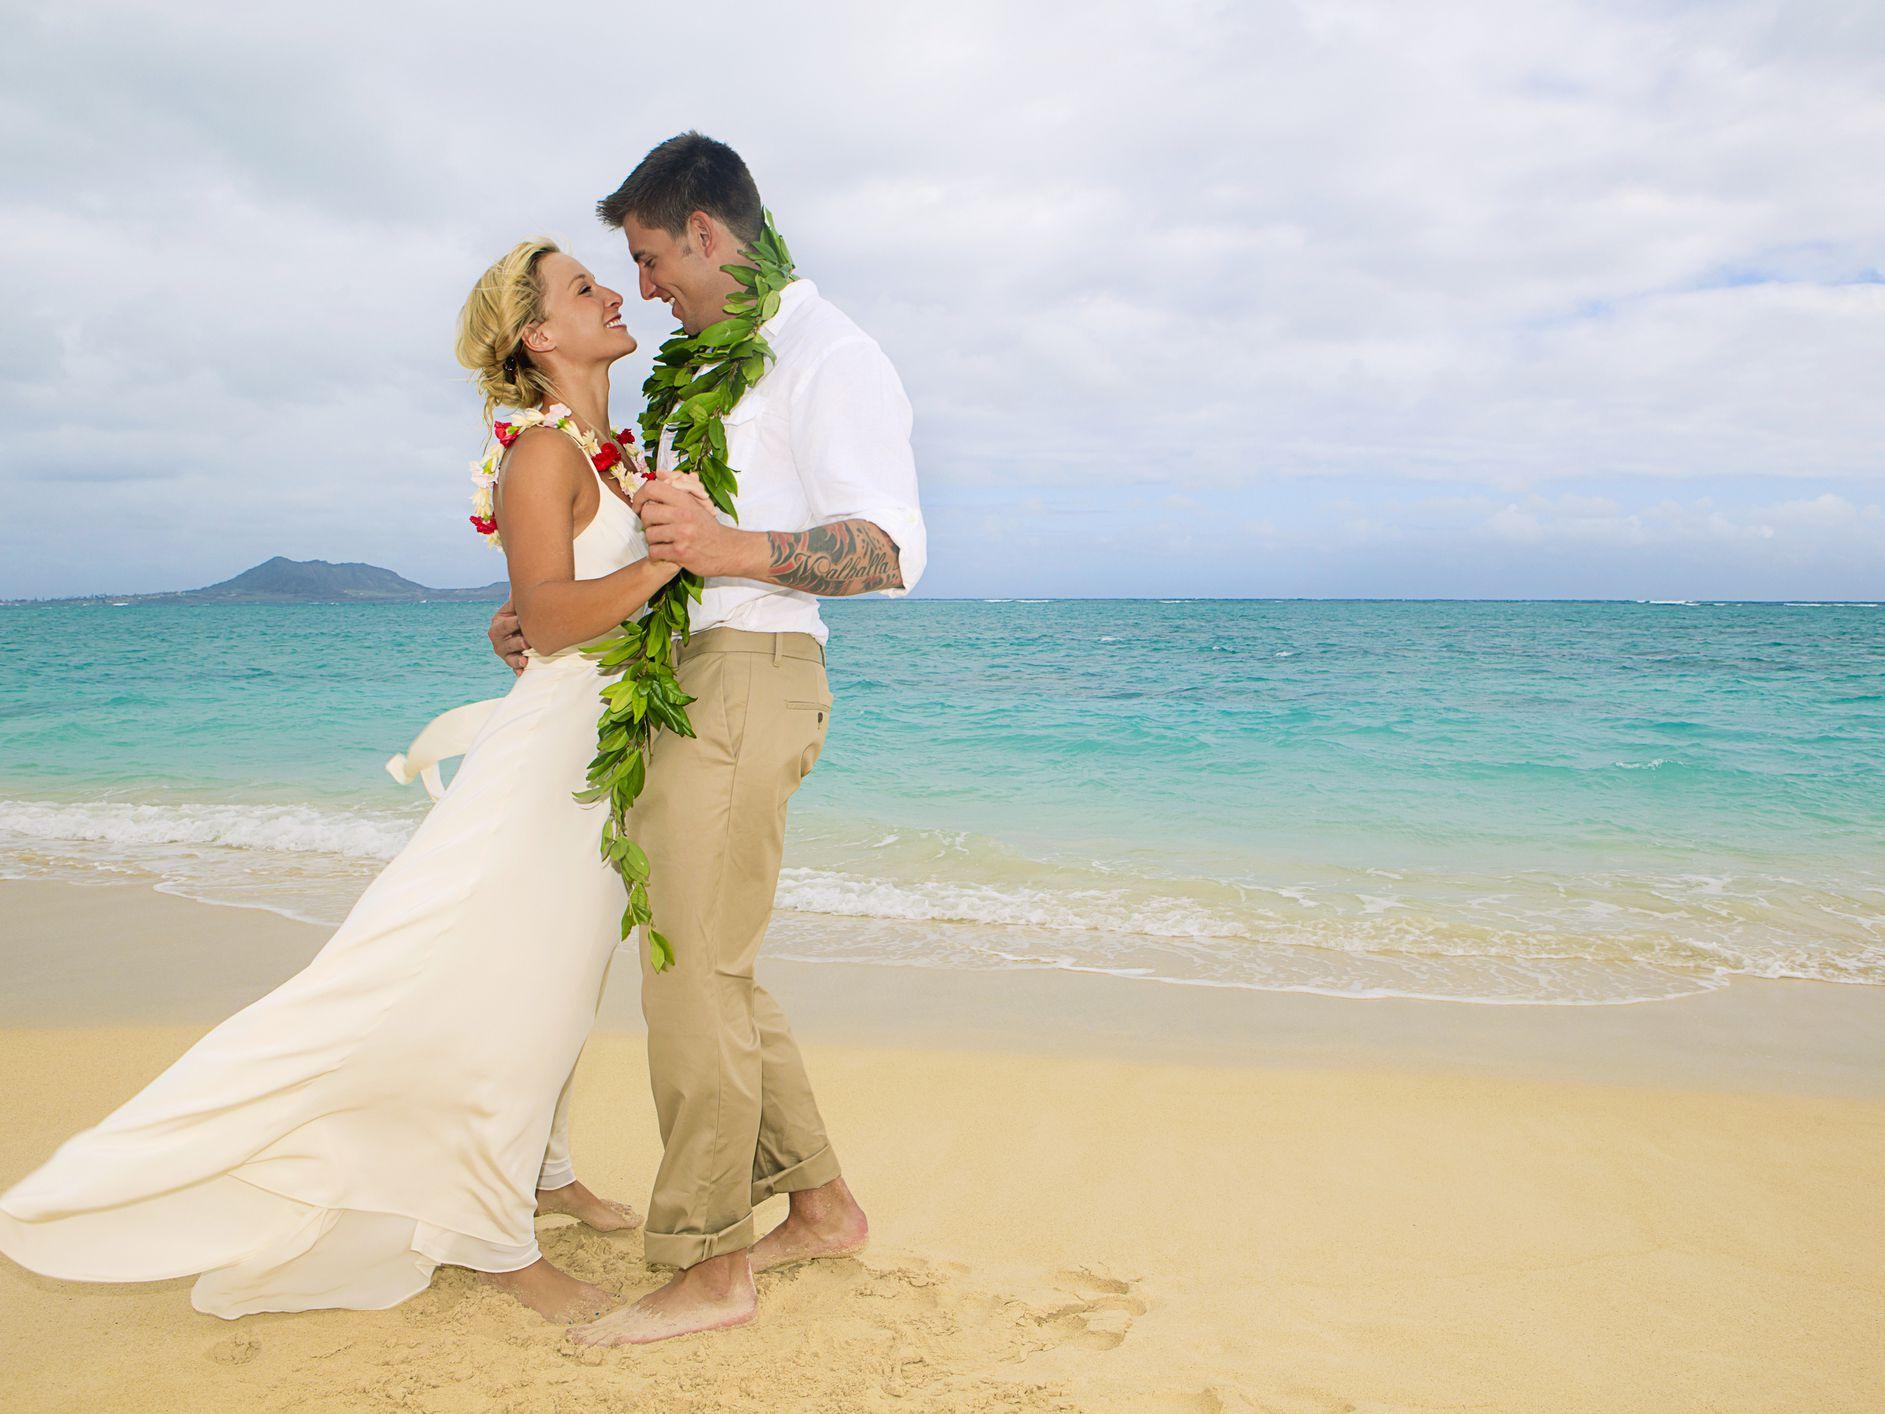 Hawaii Wedding Attire - Dos and Don'ts